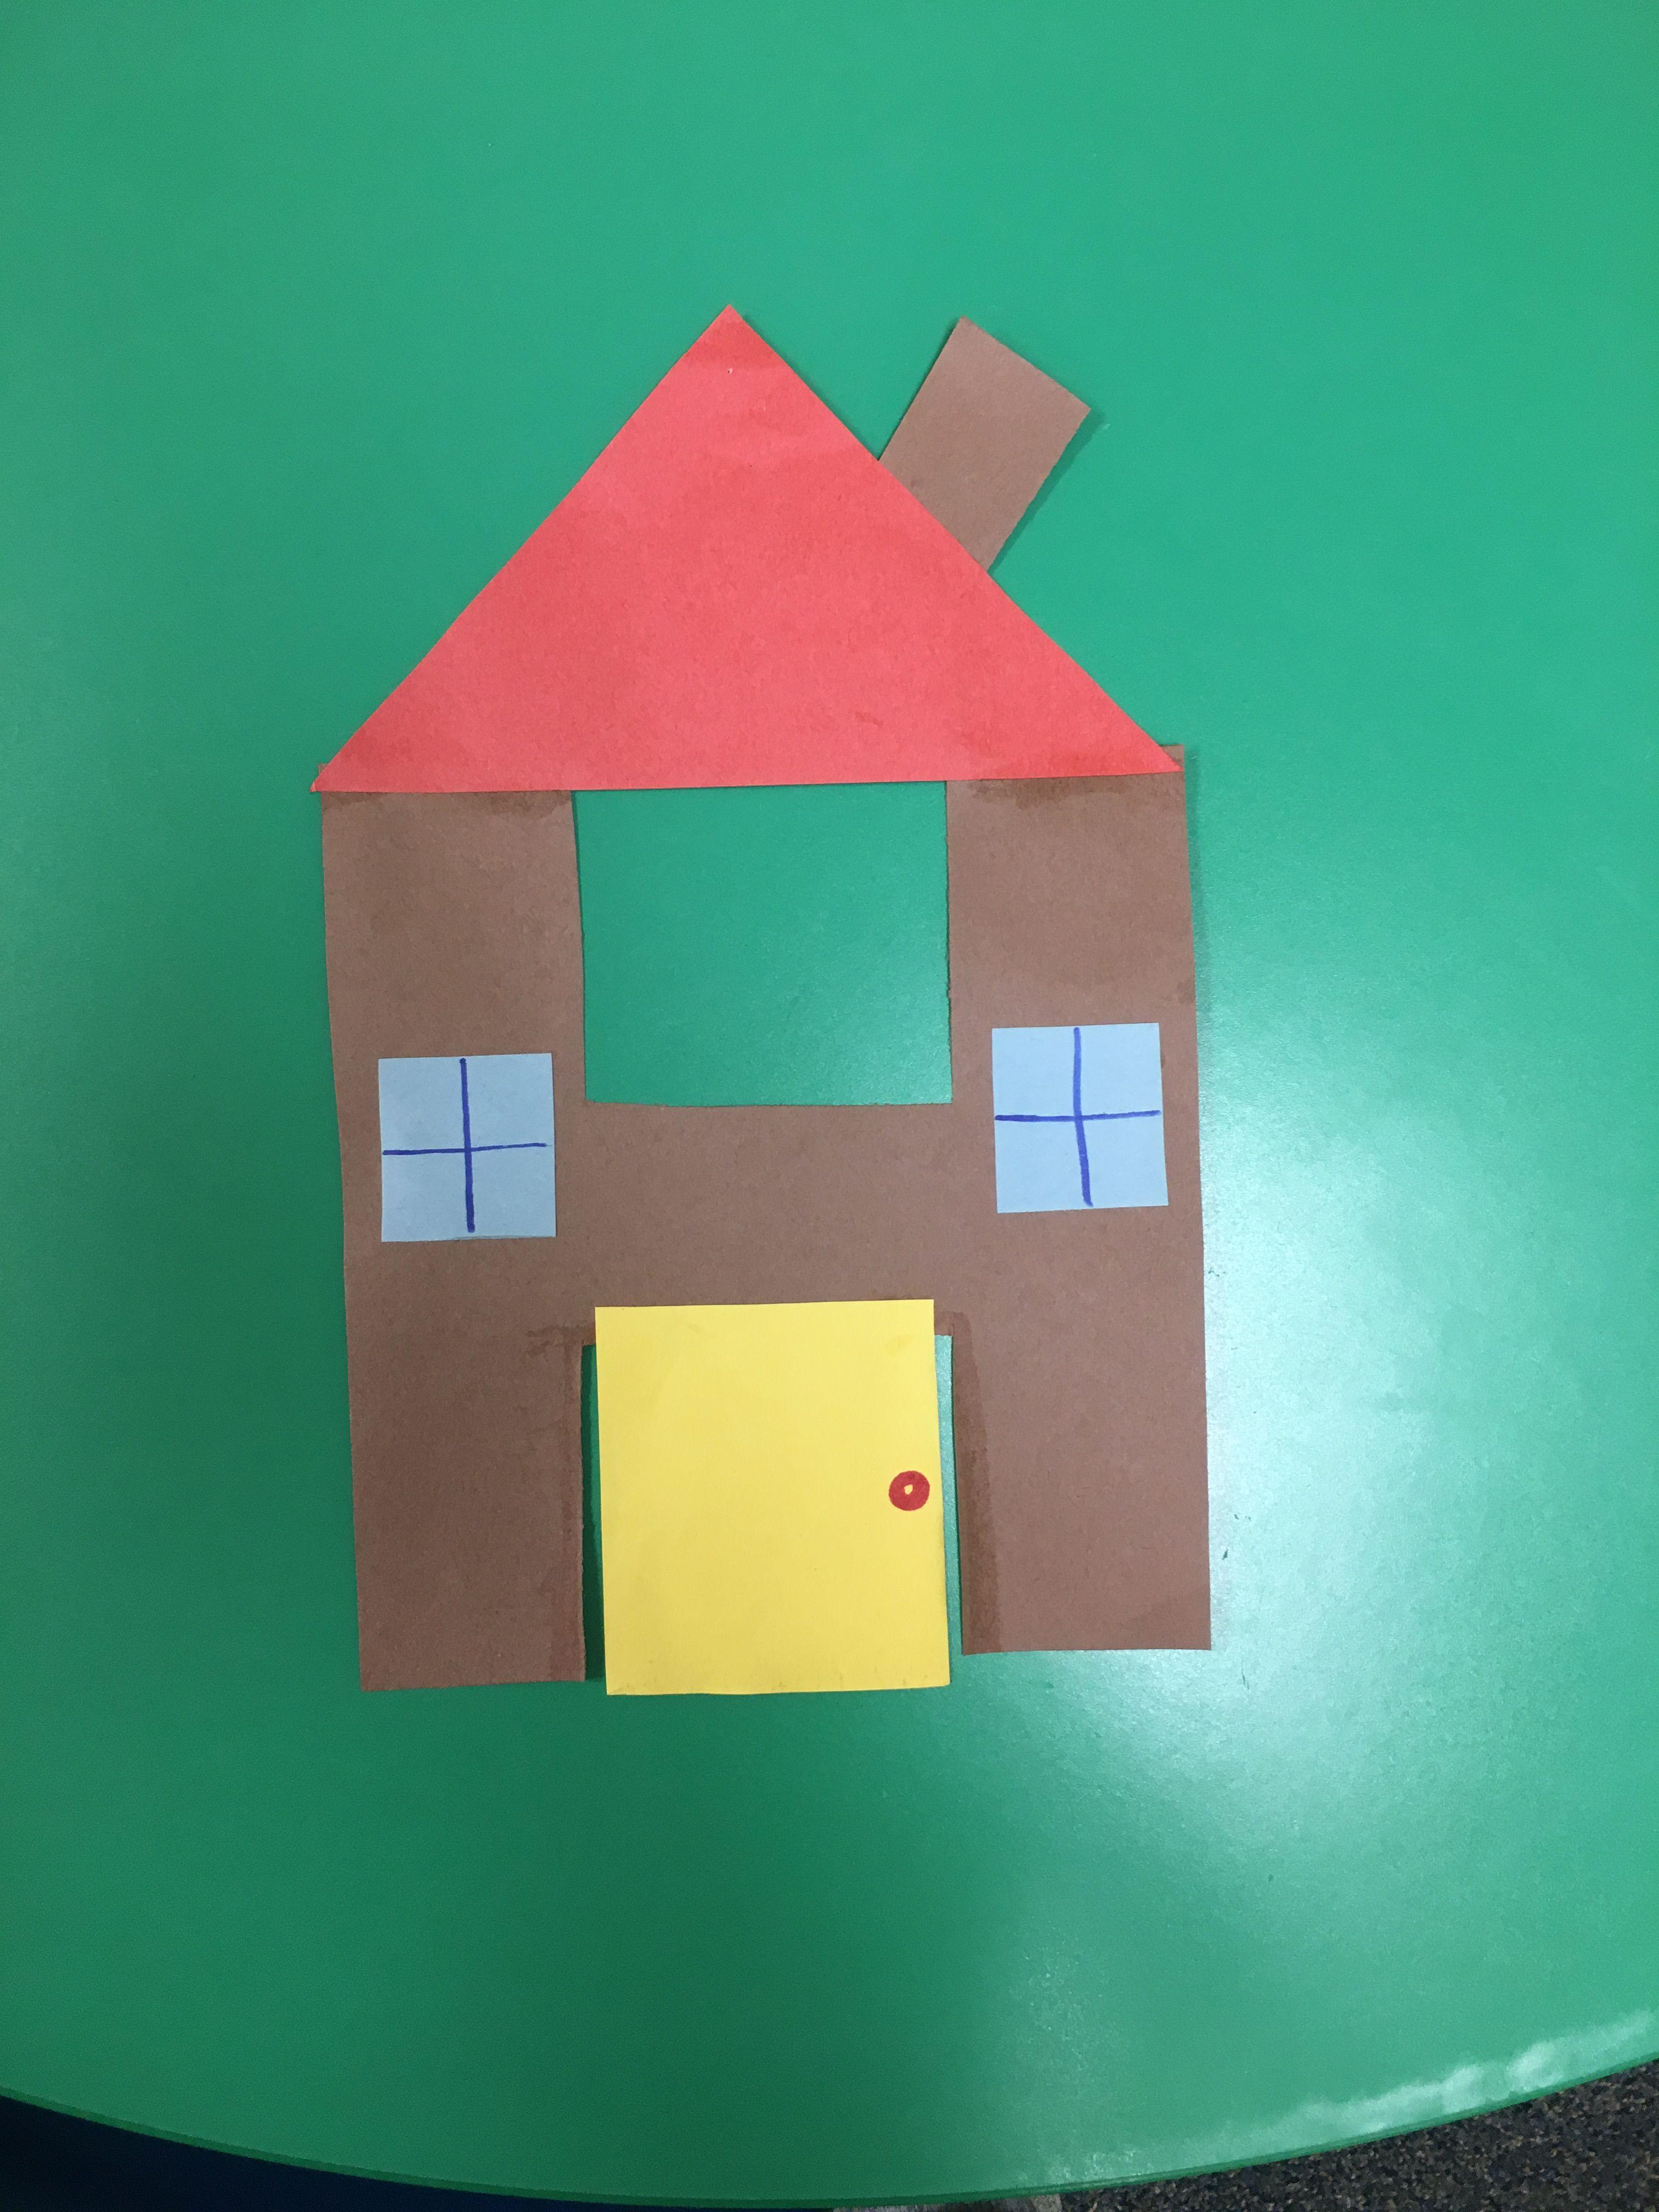 Letter H House Craft For Preschool